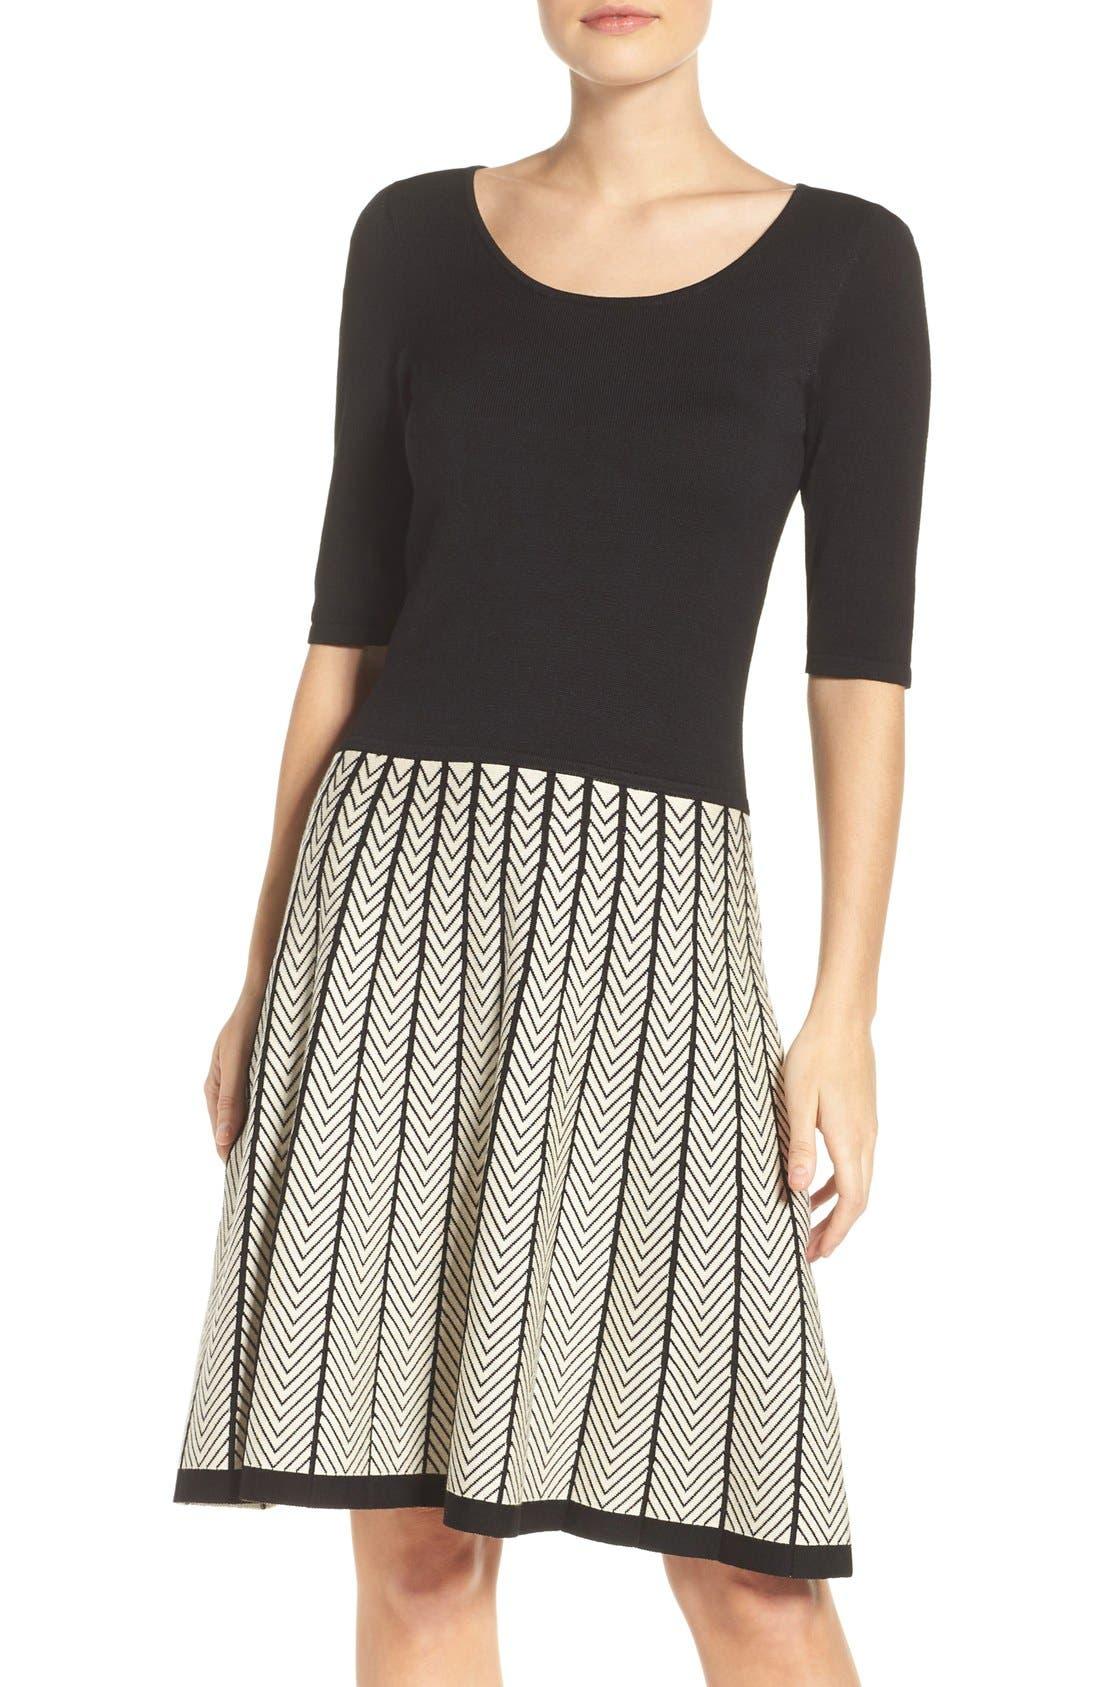 Alternate Image 1 Selected - Gabby Skye Fit & Flare Sweater Dress